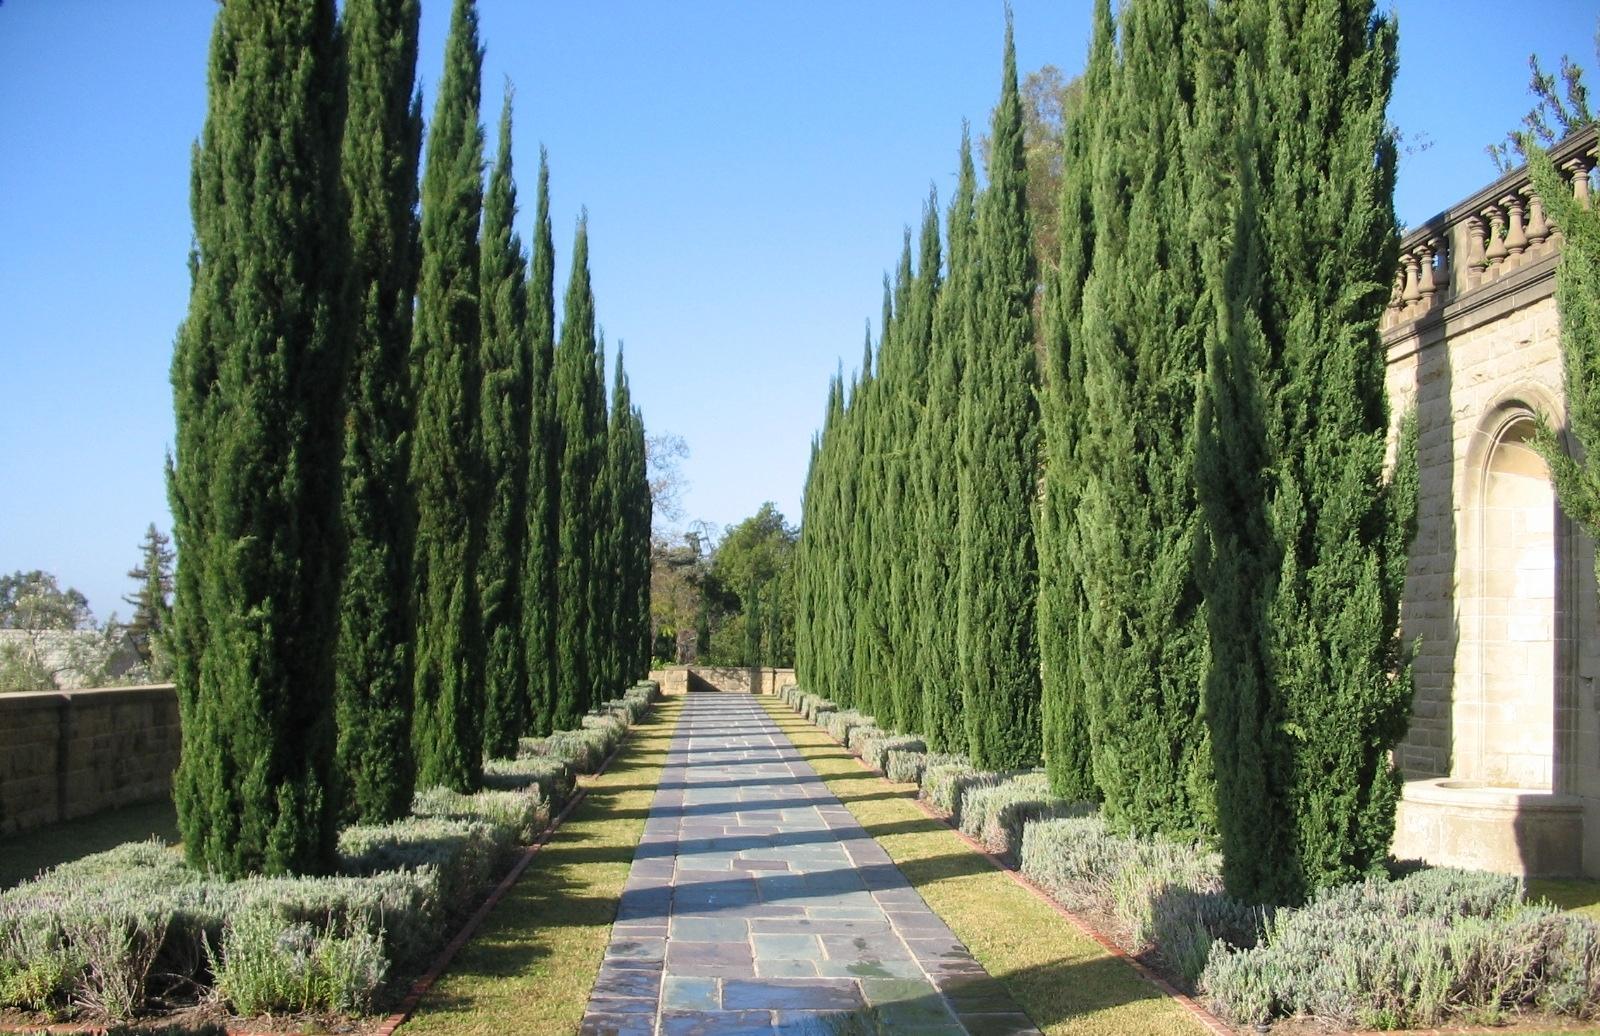 Greystone mansion gardens the doheny estate for The greystone